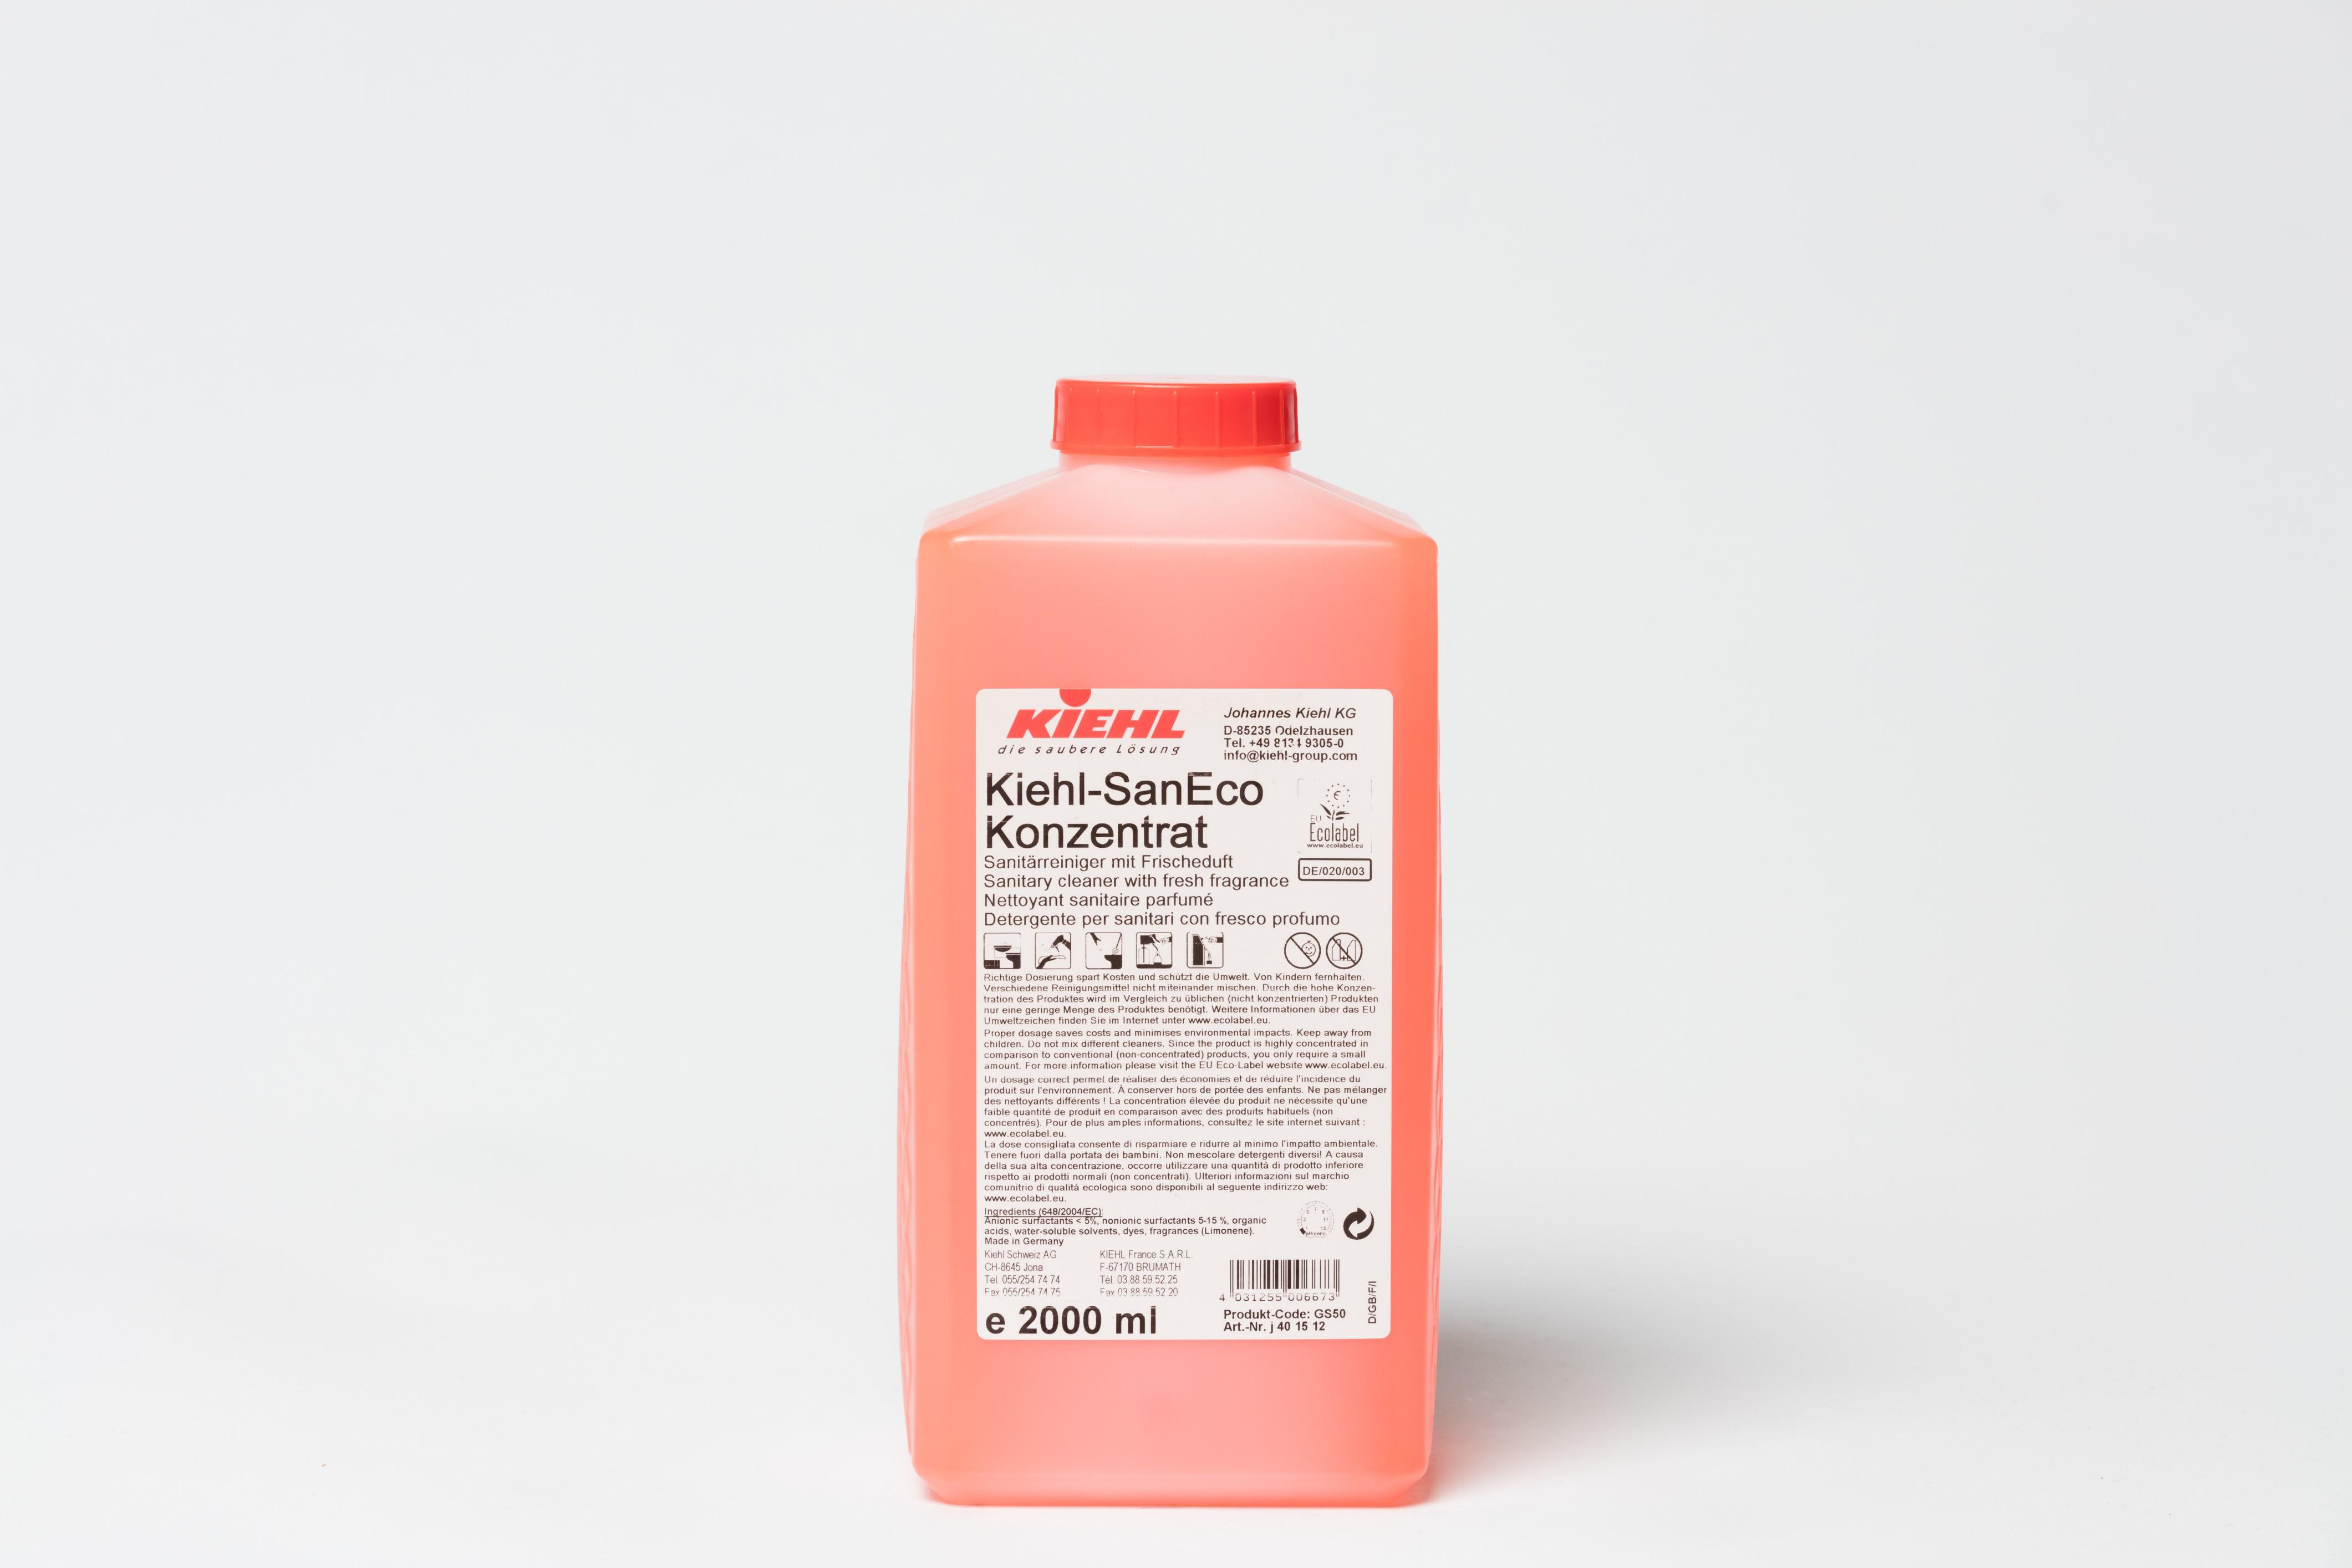 Kiehl-SanEco Concentrato Detergente per sanitari con fresco profumo_Flacone 2 lt